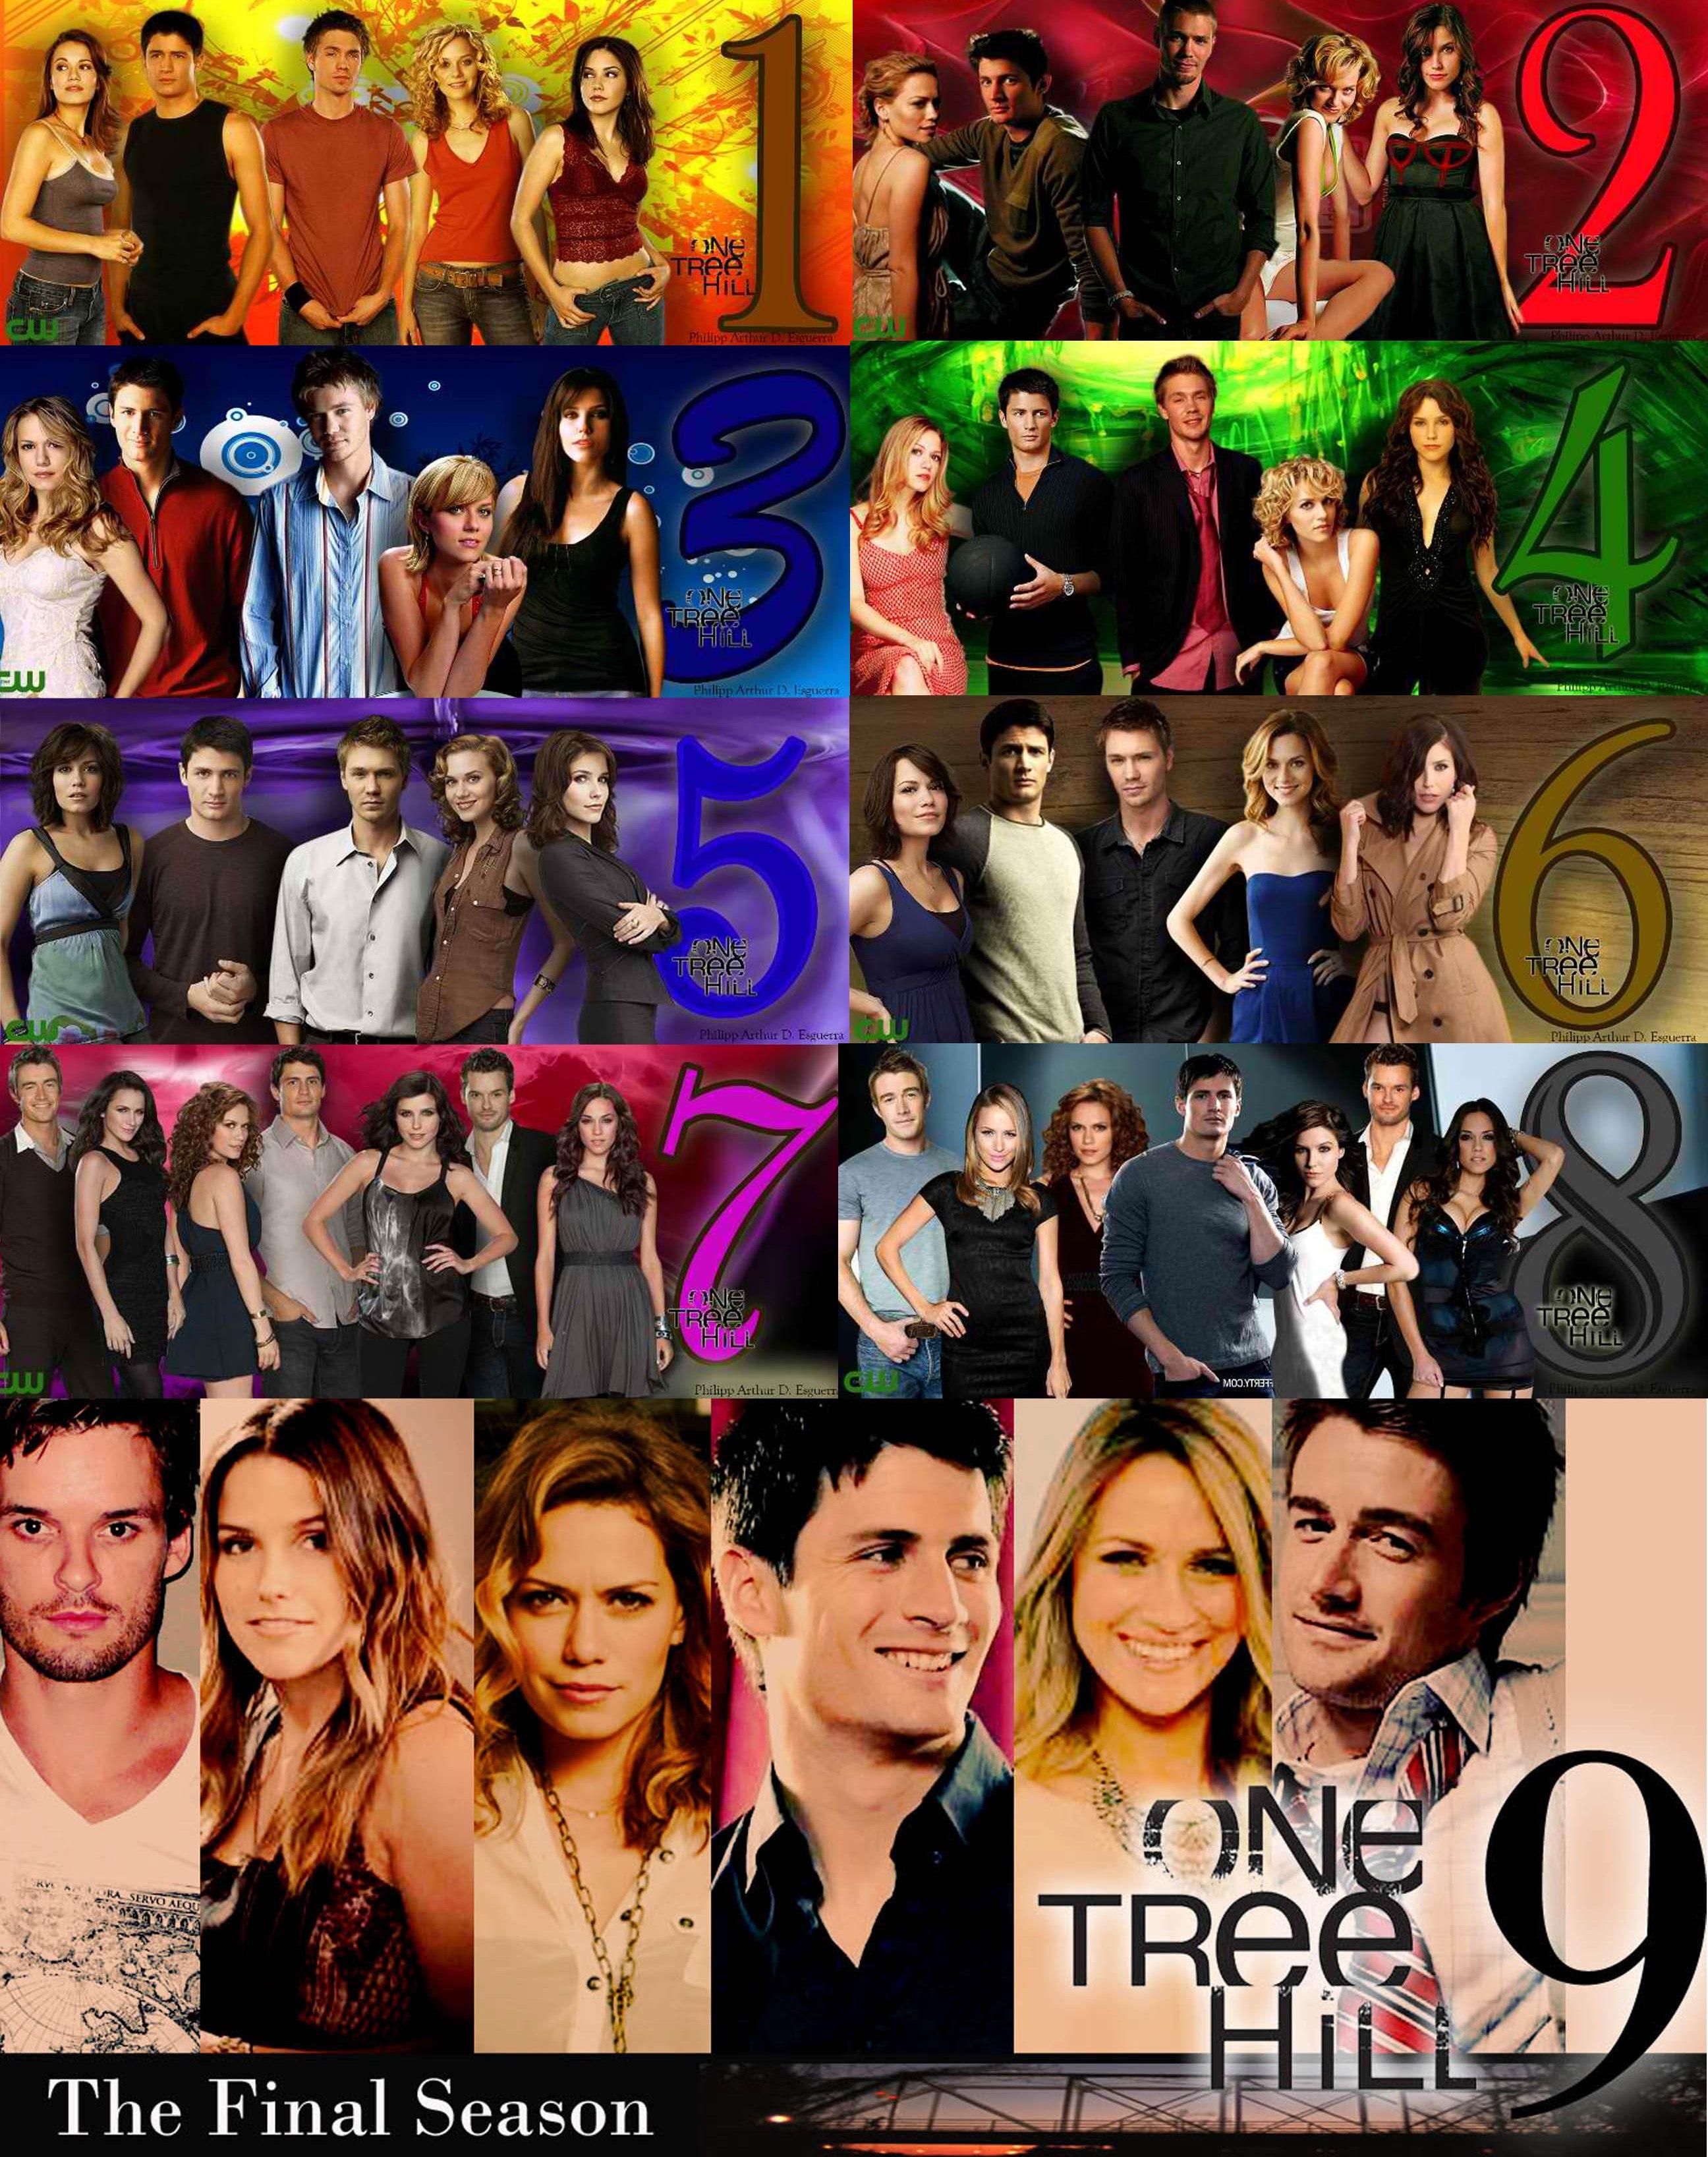 one tree hill season 3 full episodes free online